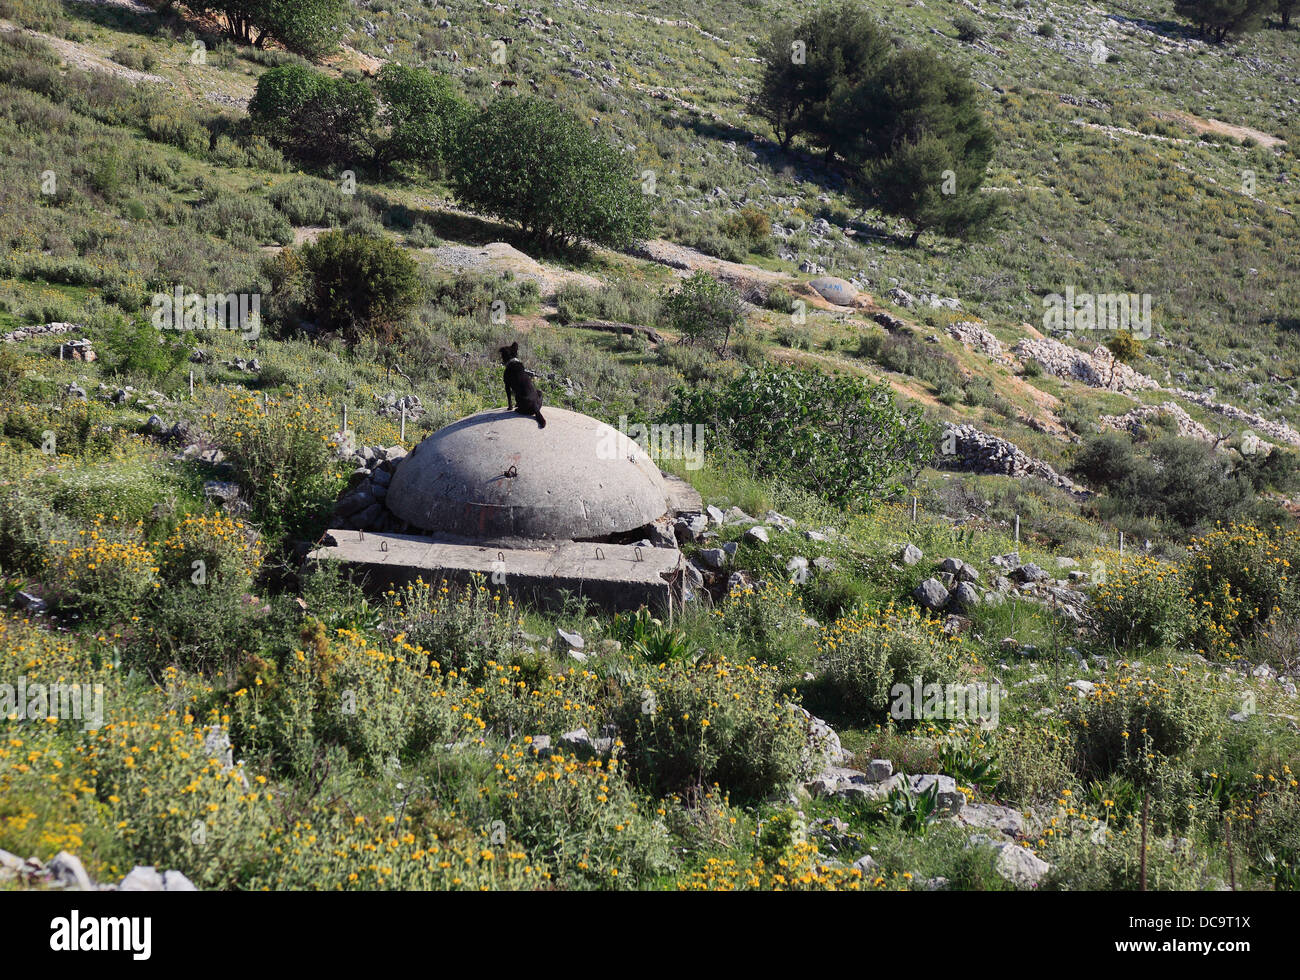 A bunker built in the area of Enver Hoxha, near Berat, Albania - Stock Image